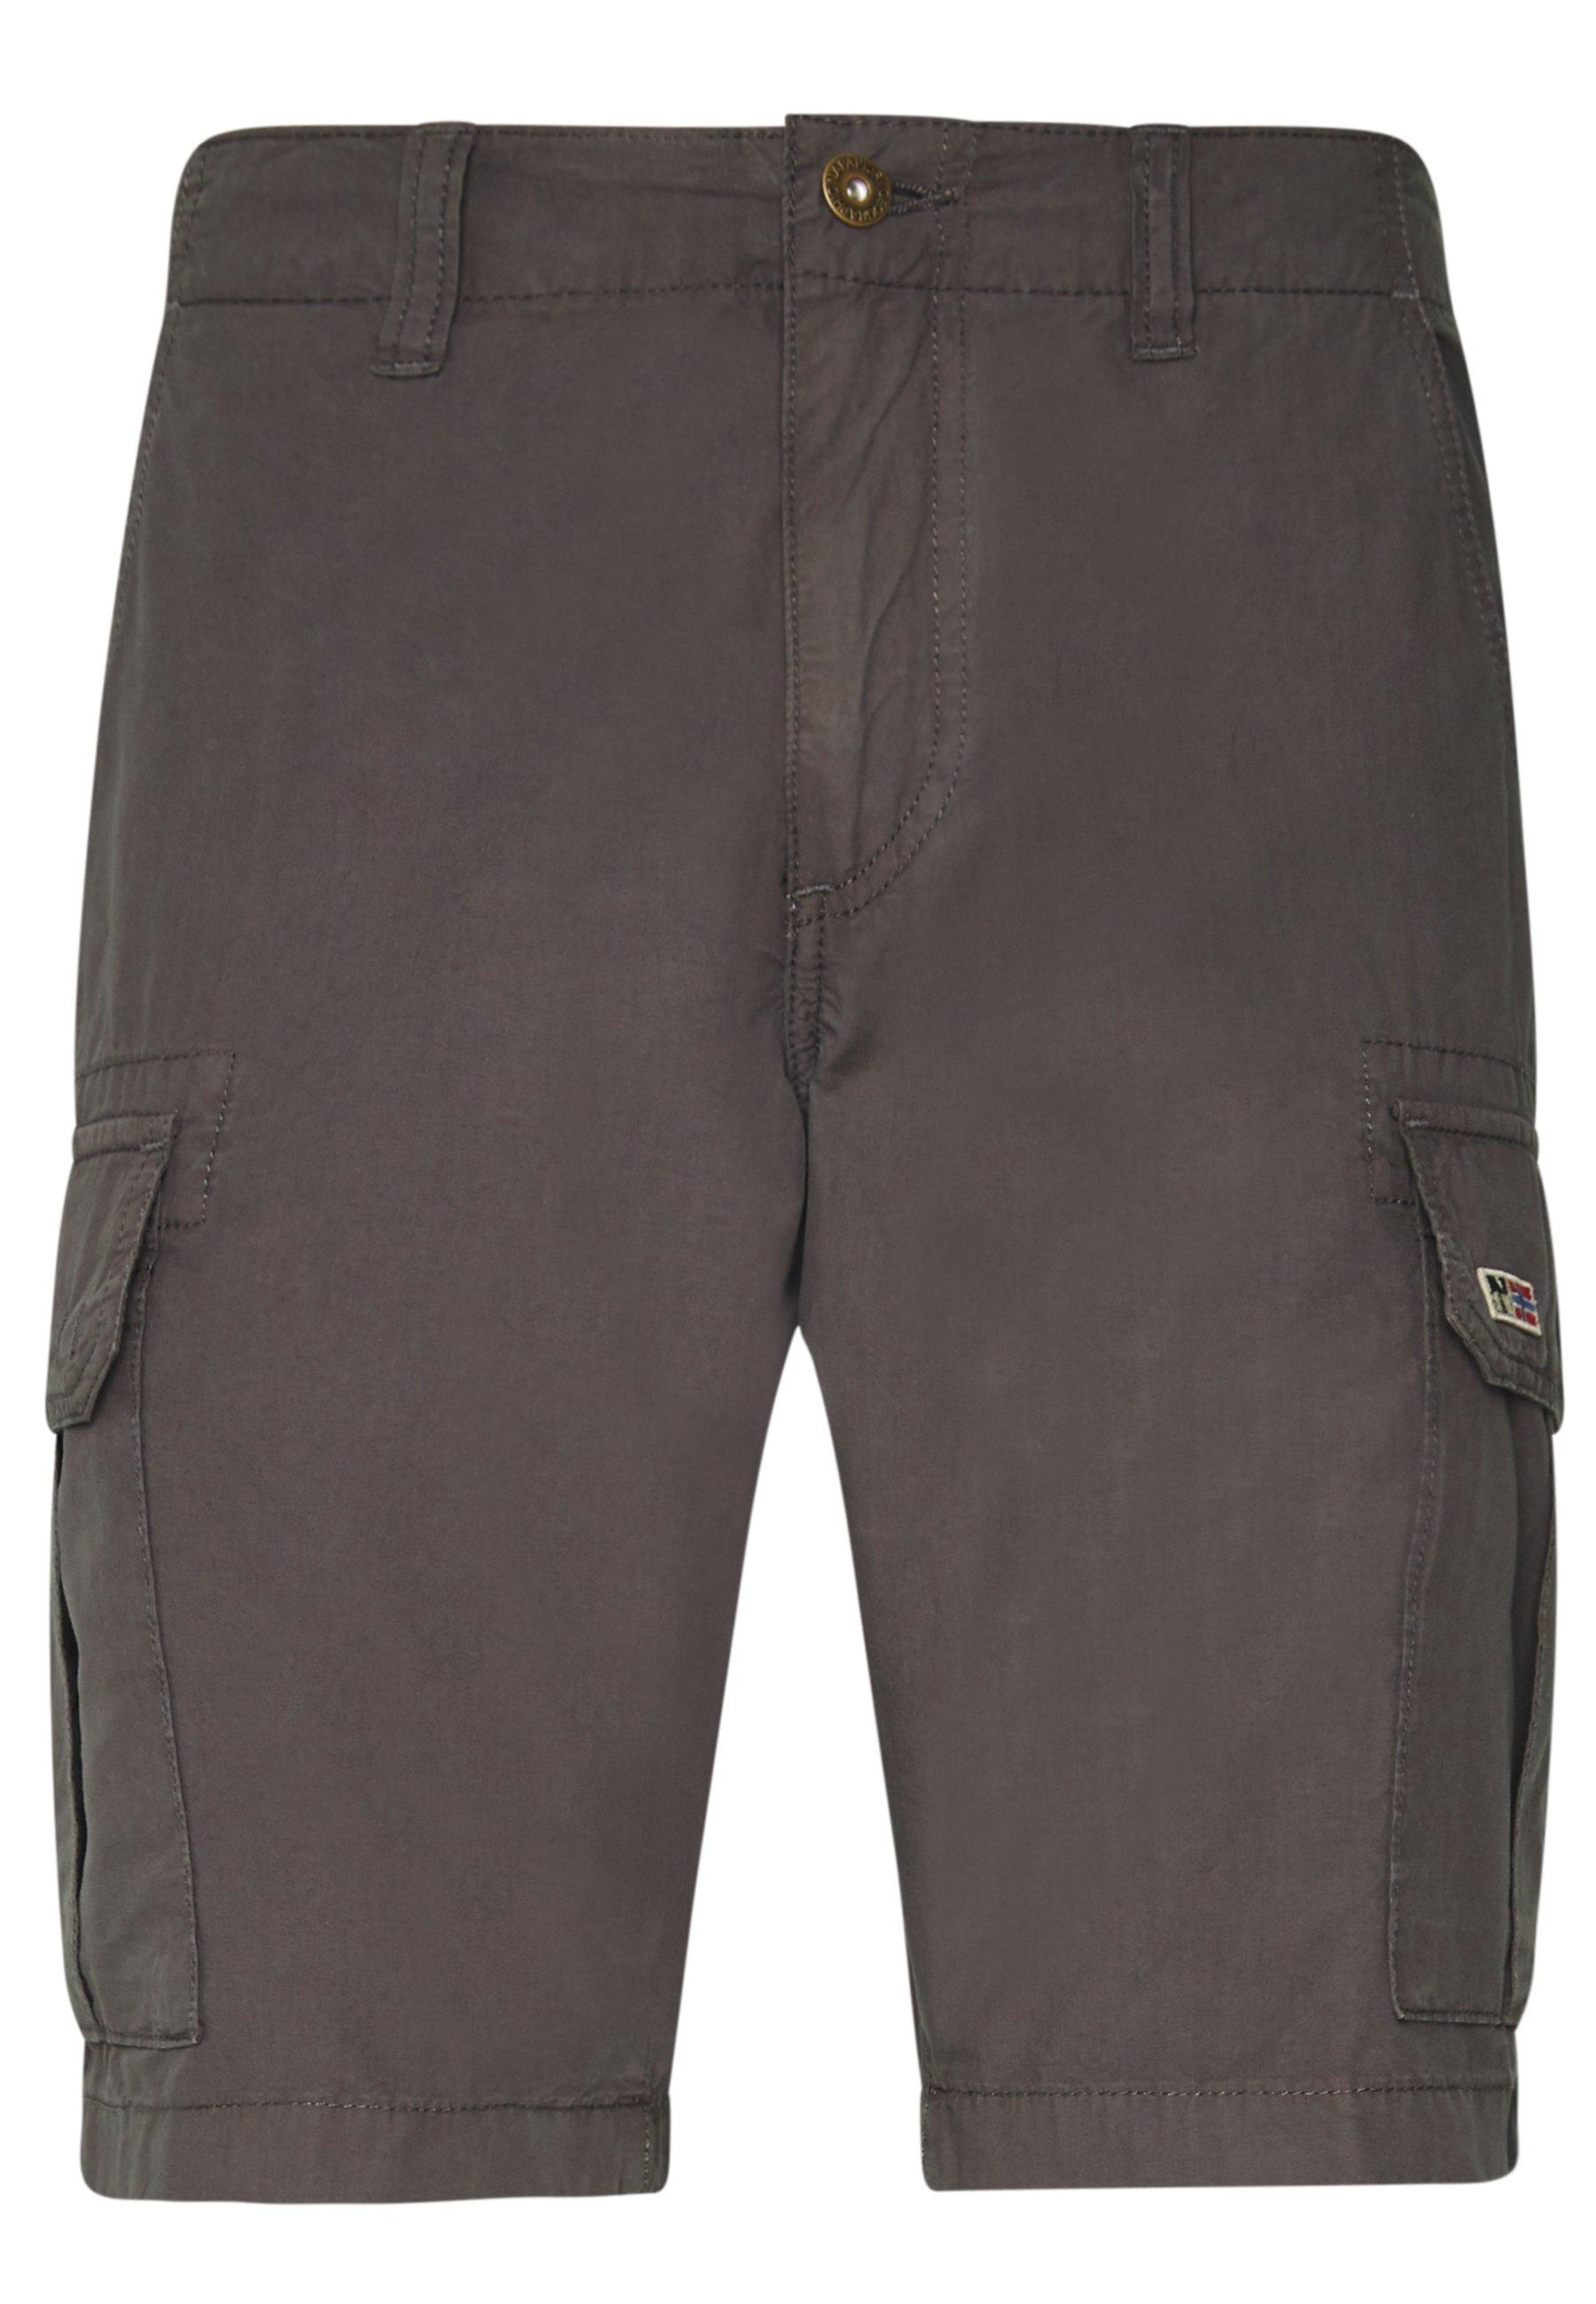 Napapijri Noto - Shorts Volcano